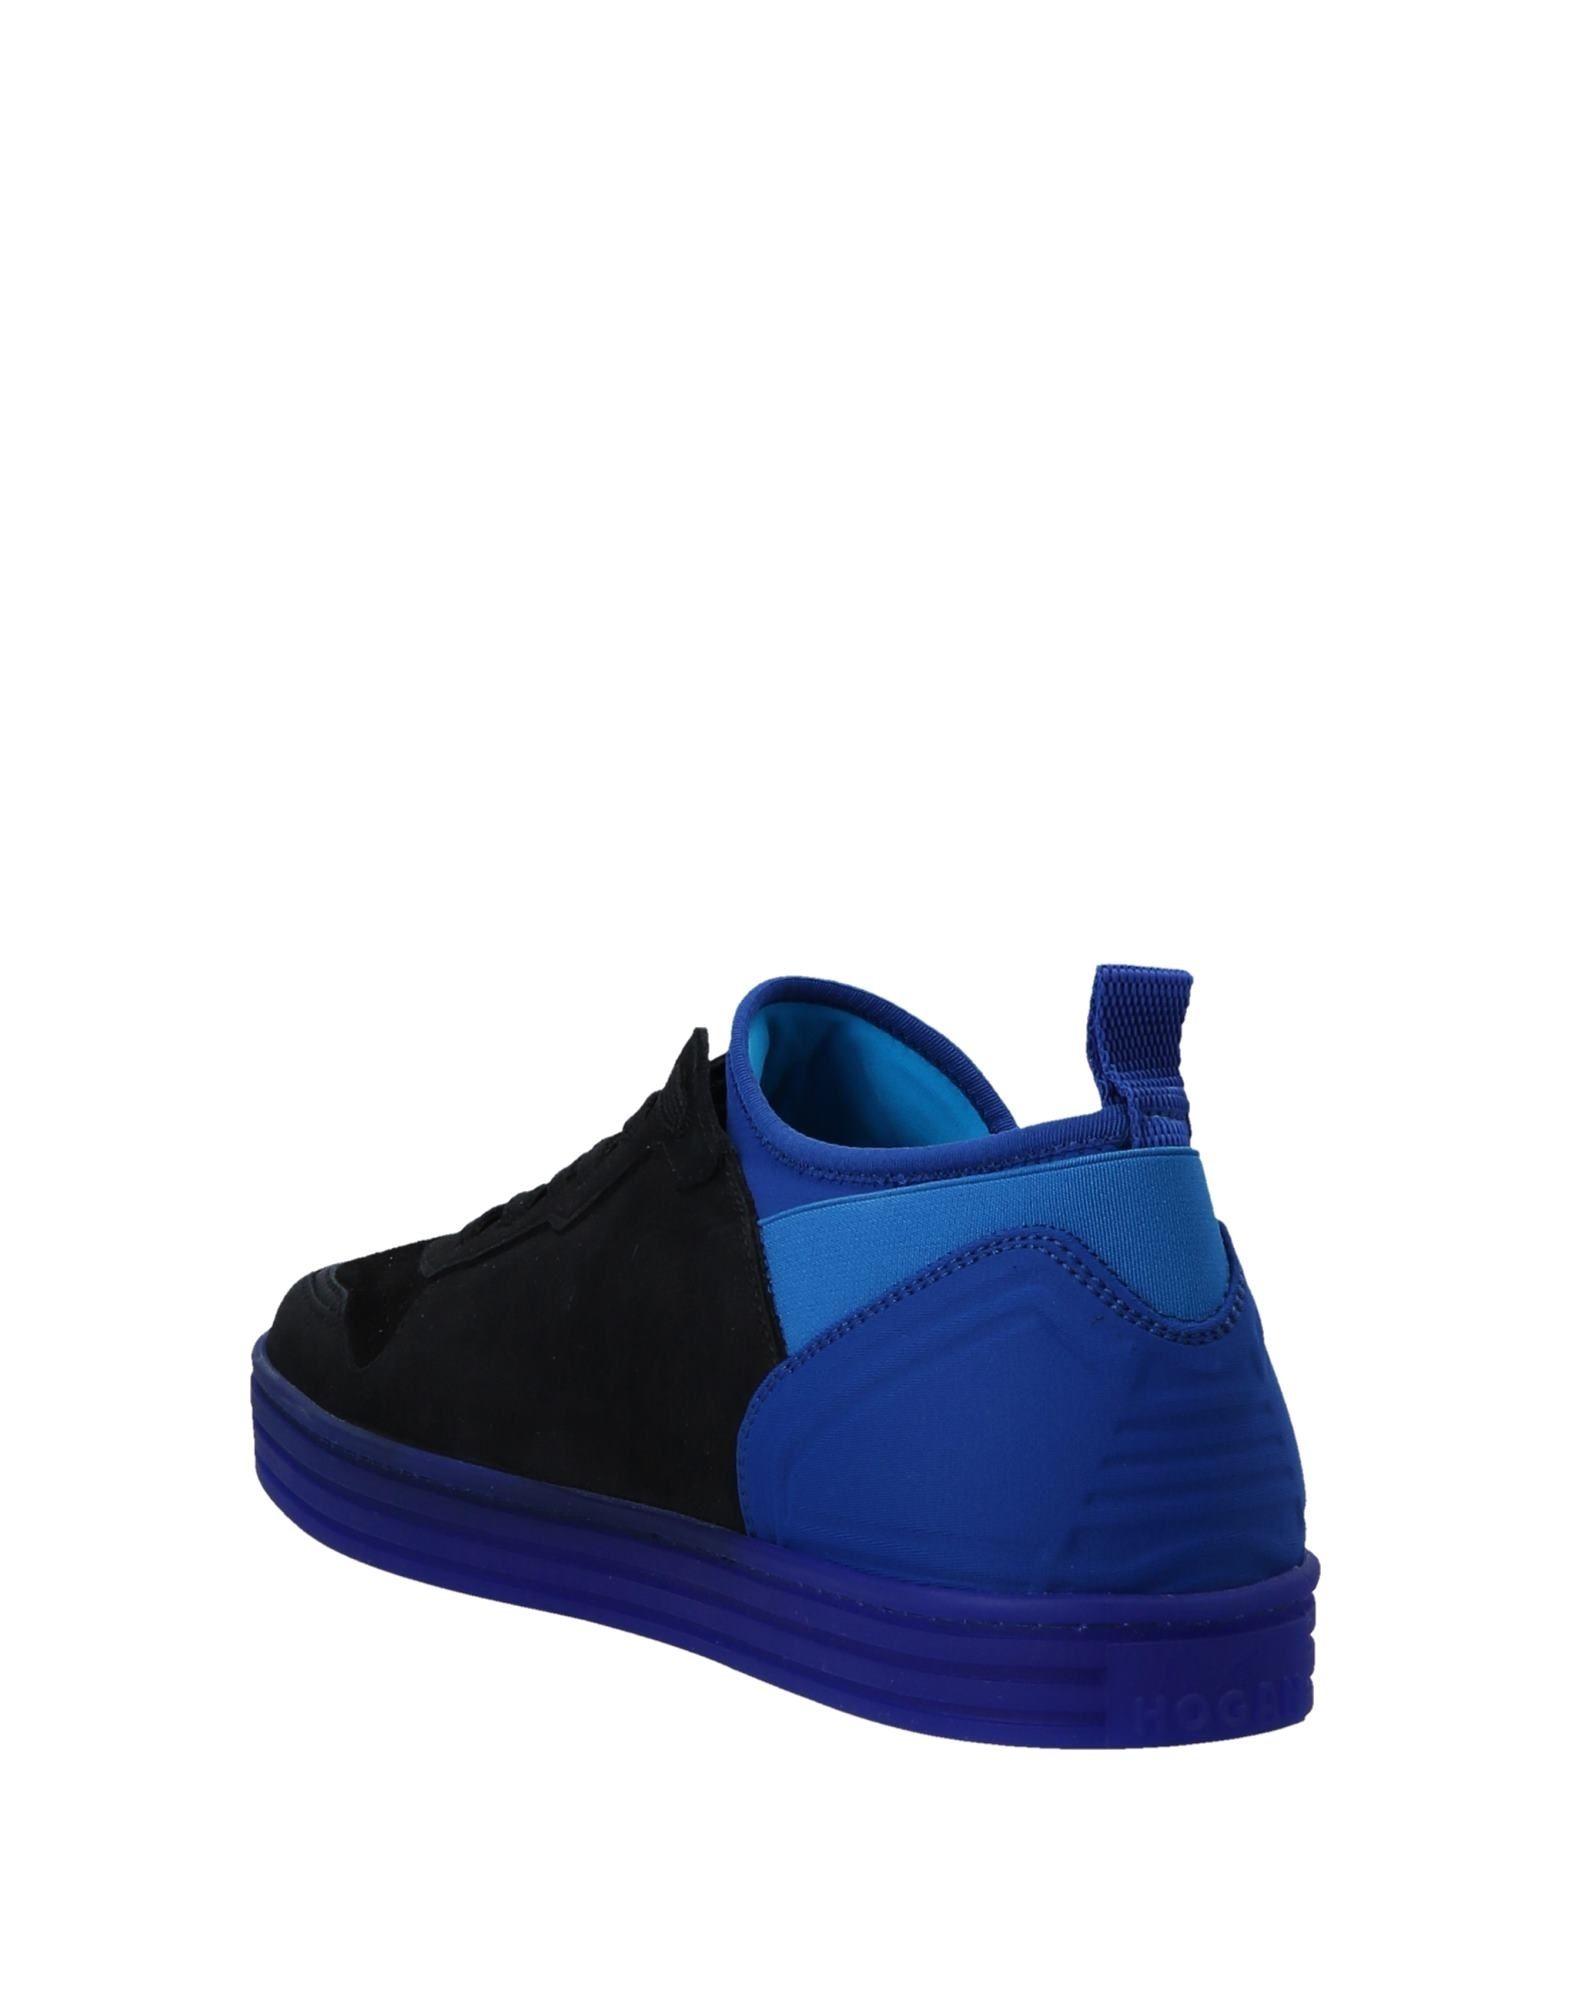 Hogan Sneakers Gute Herren  11559965EK Gute Sneakers Qualität beliebte Schuhe 51f05e